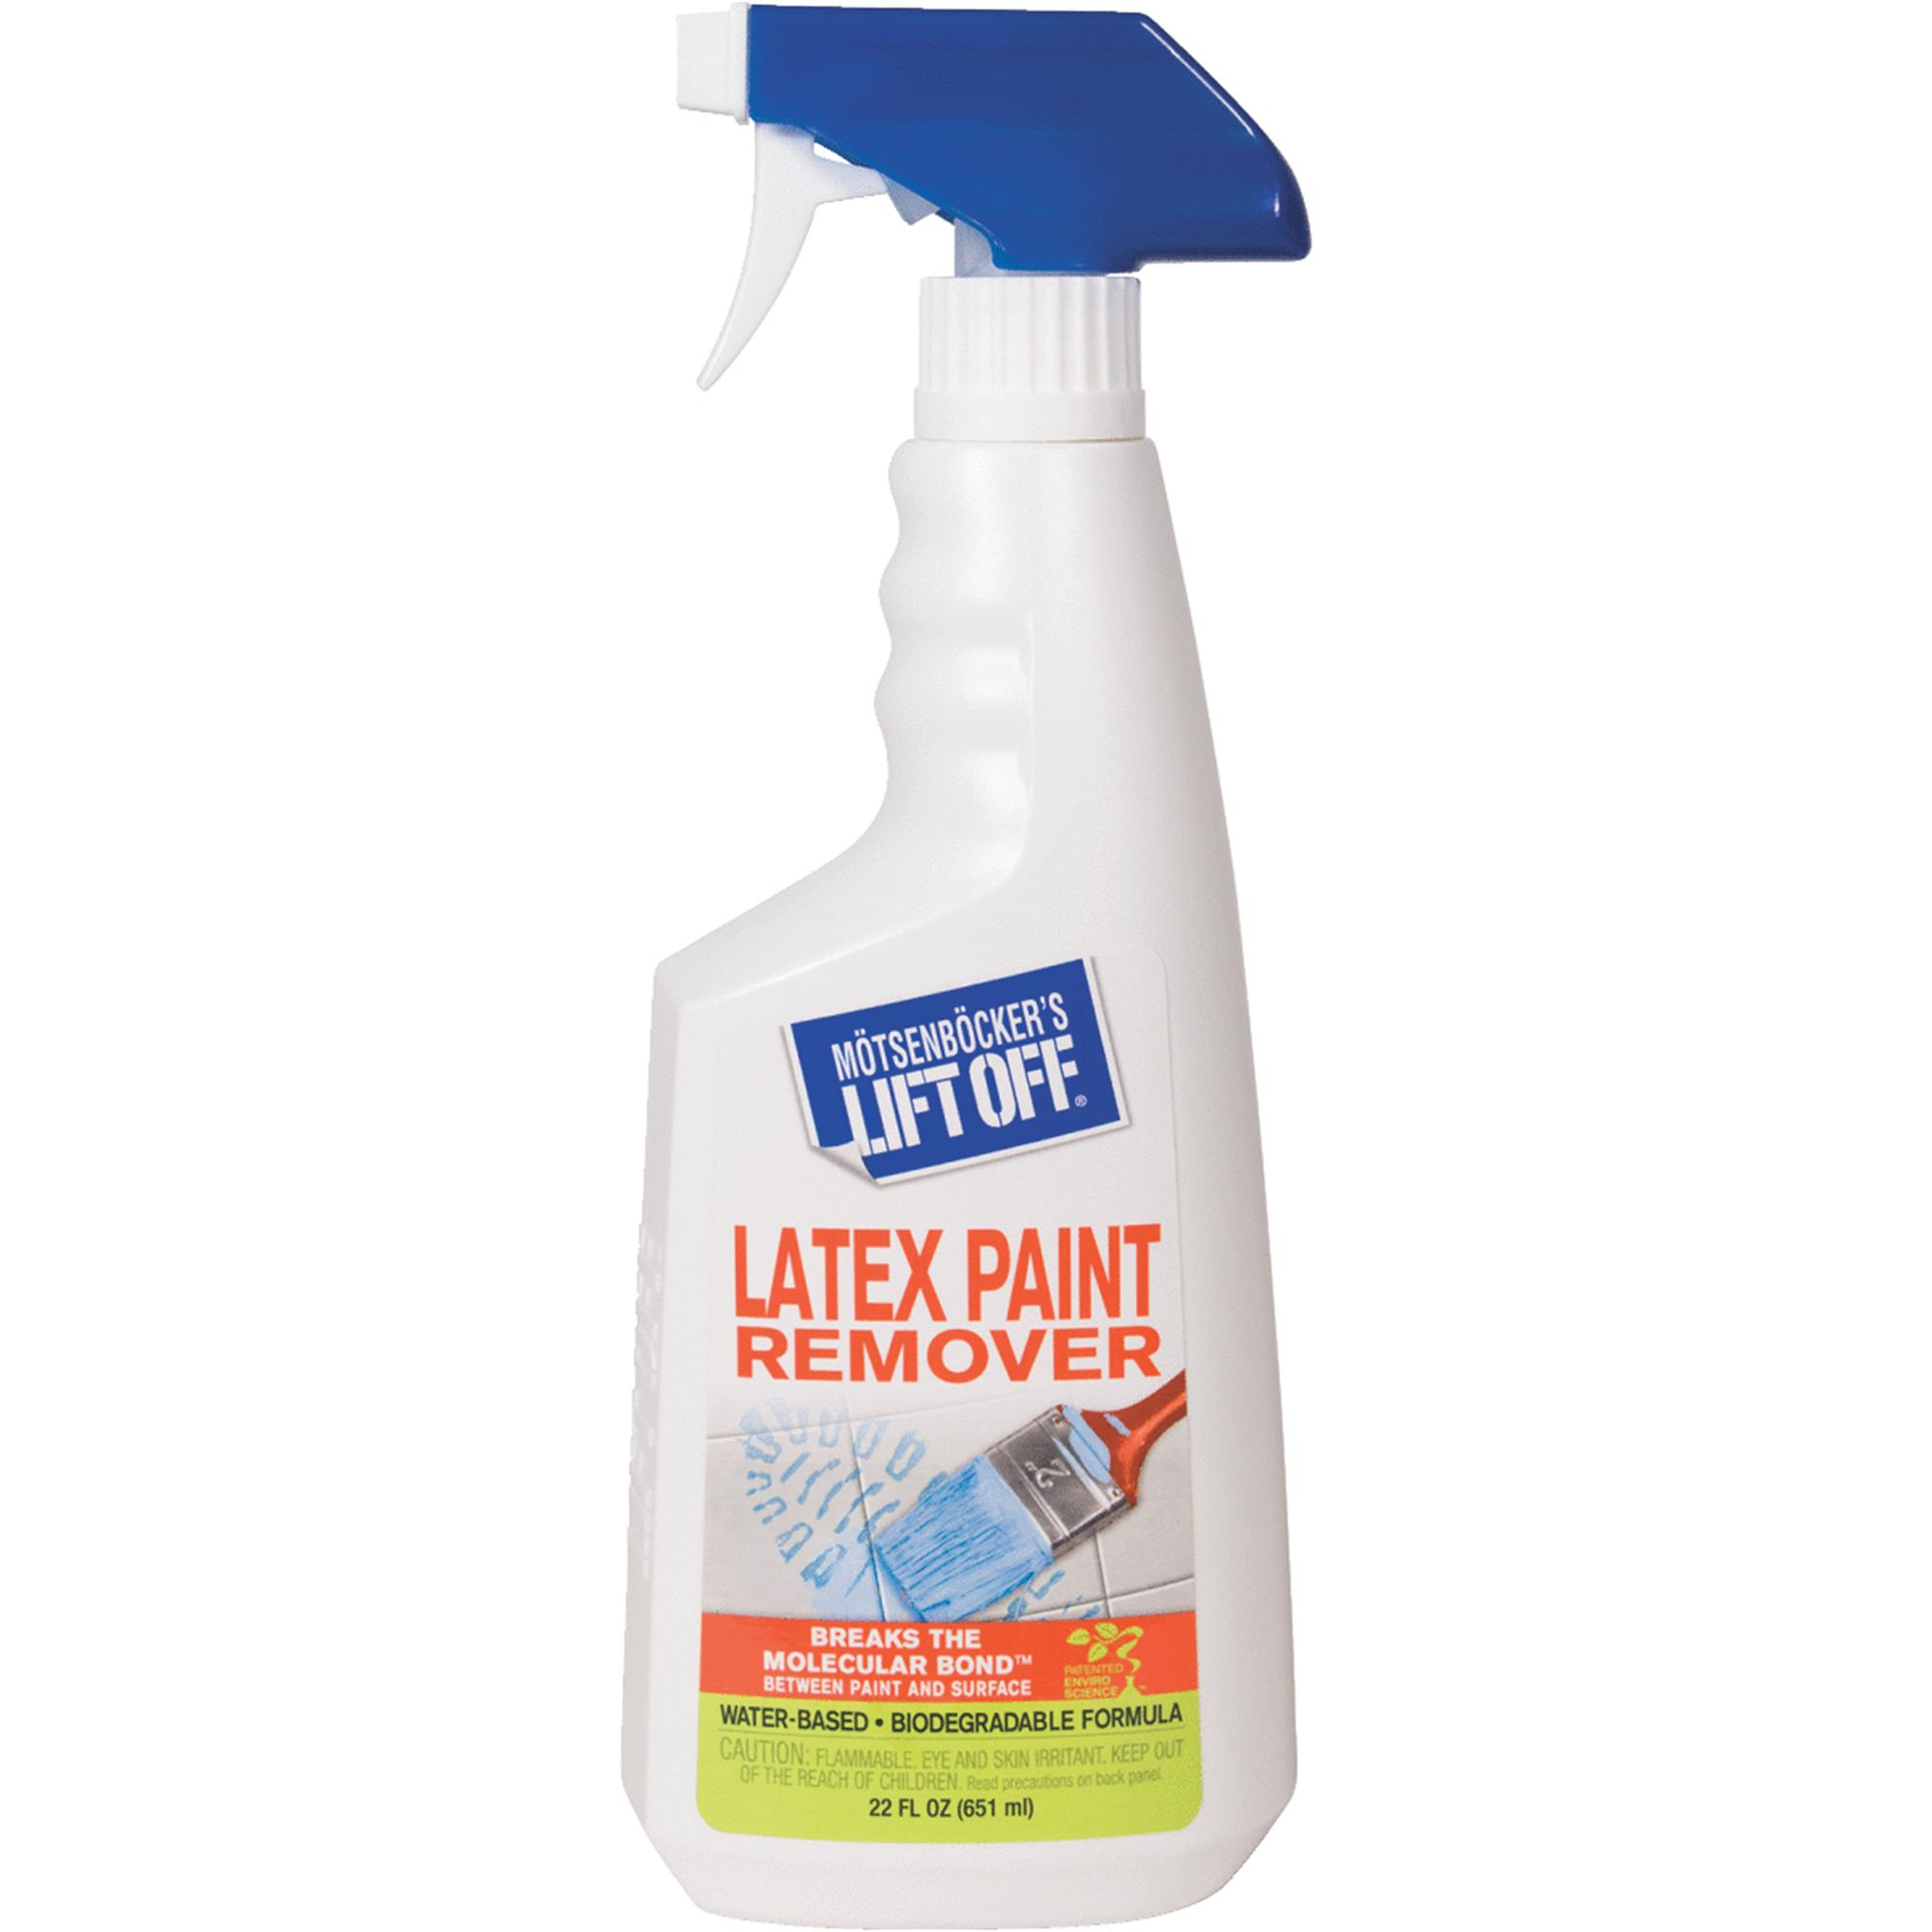 Motsenbocker's Latex Dried Paint Remover by Stoner